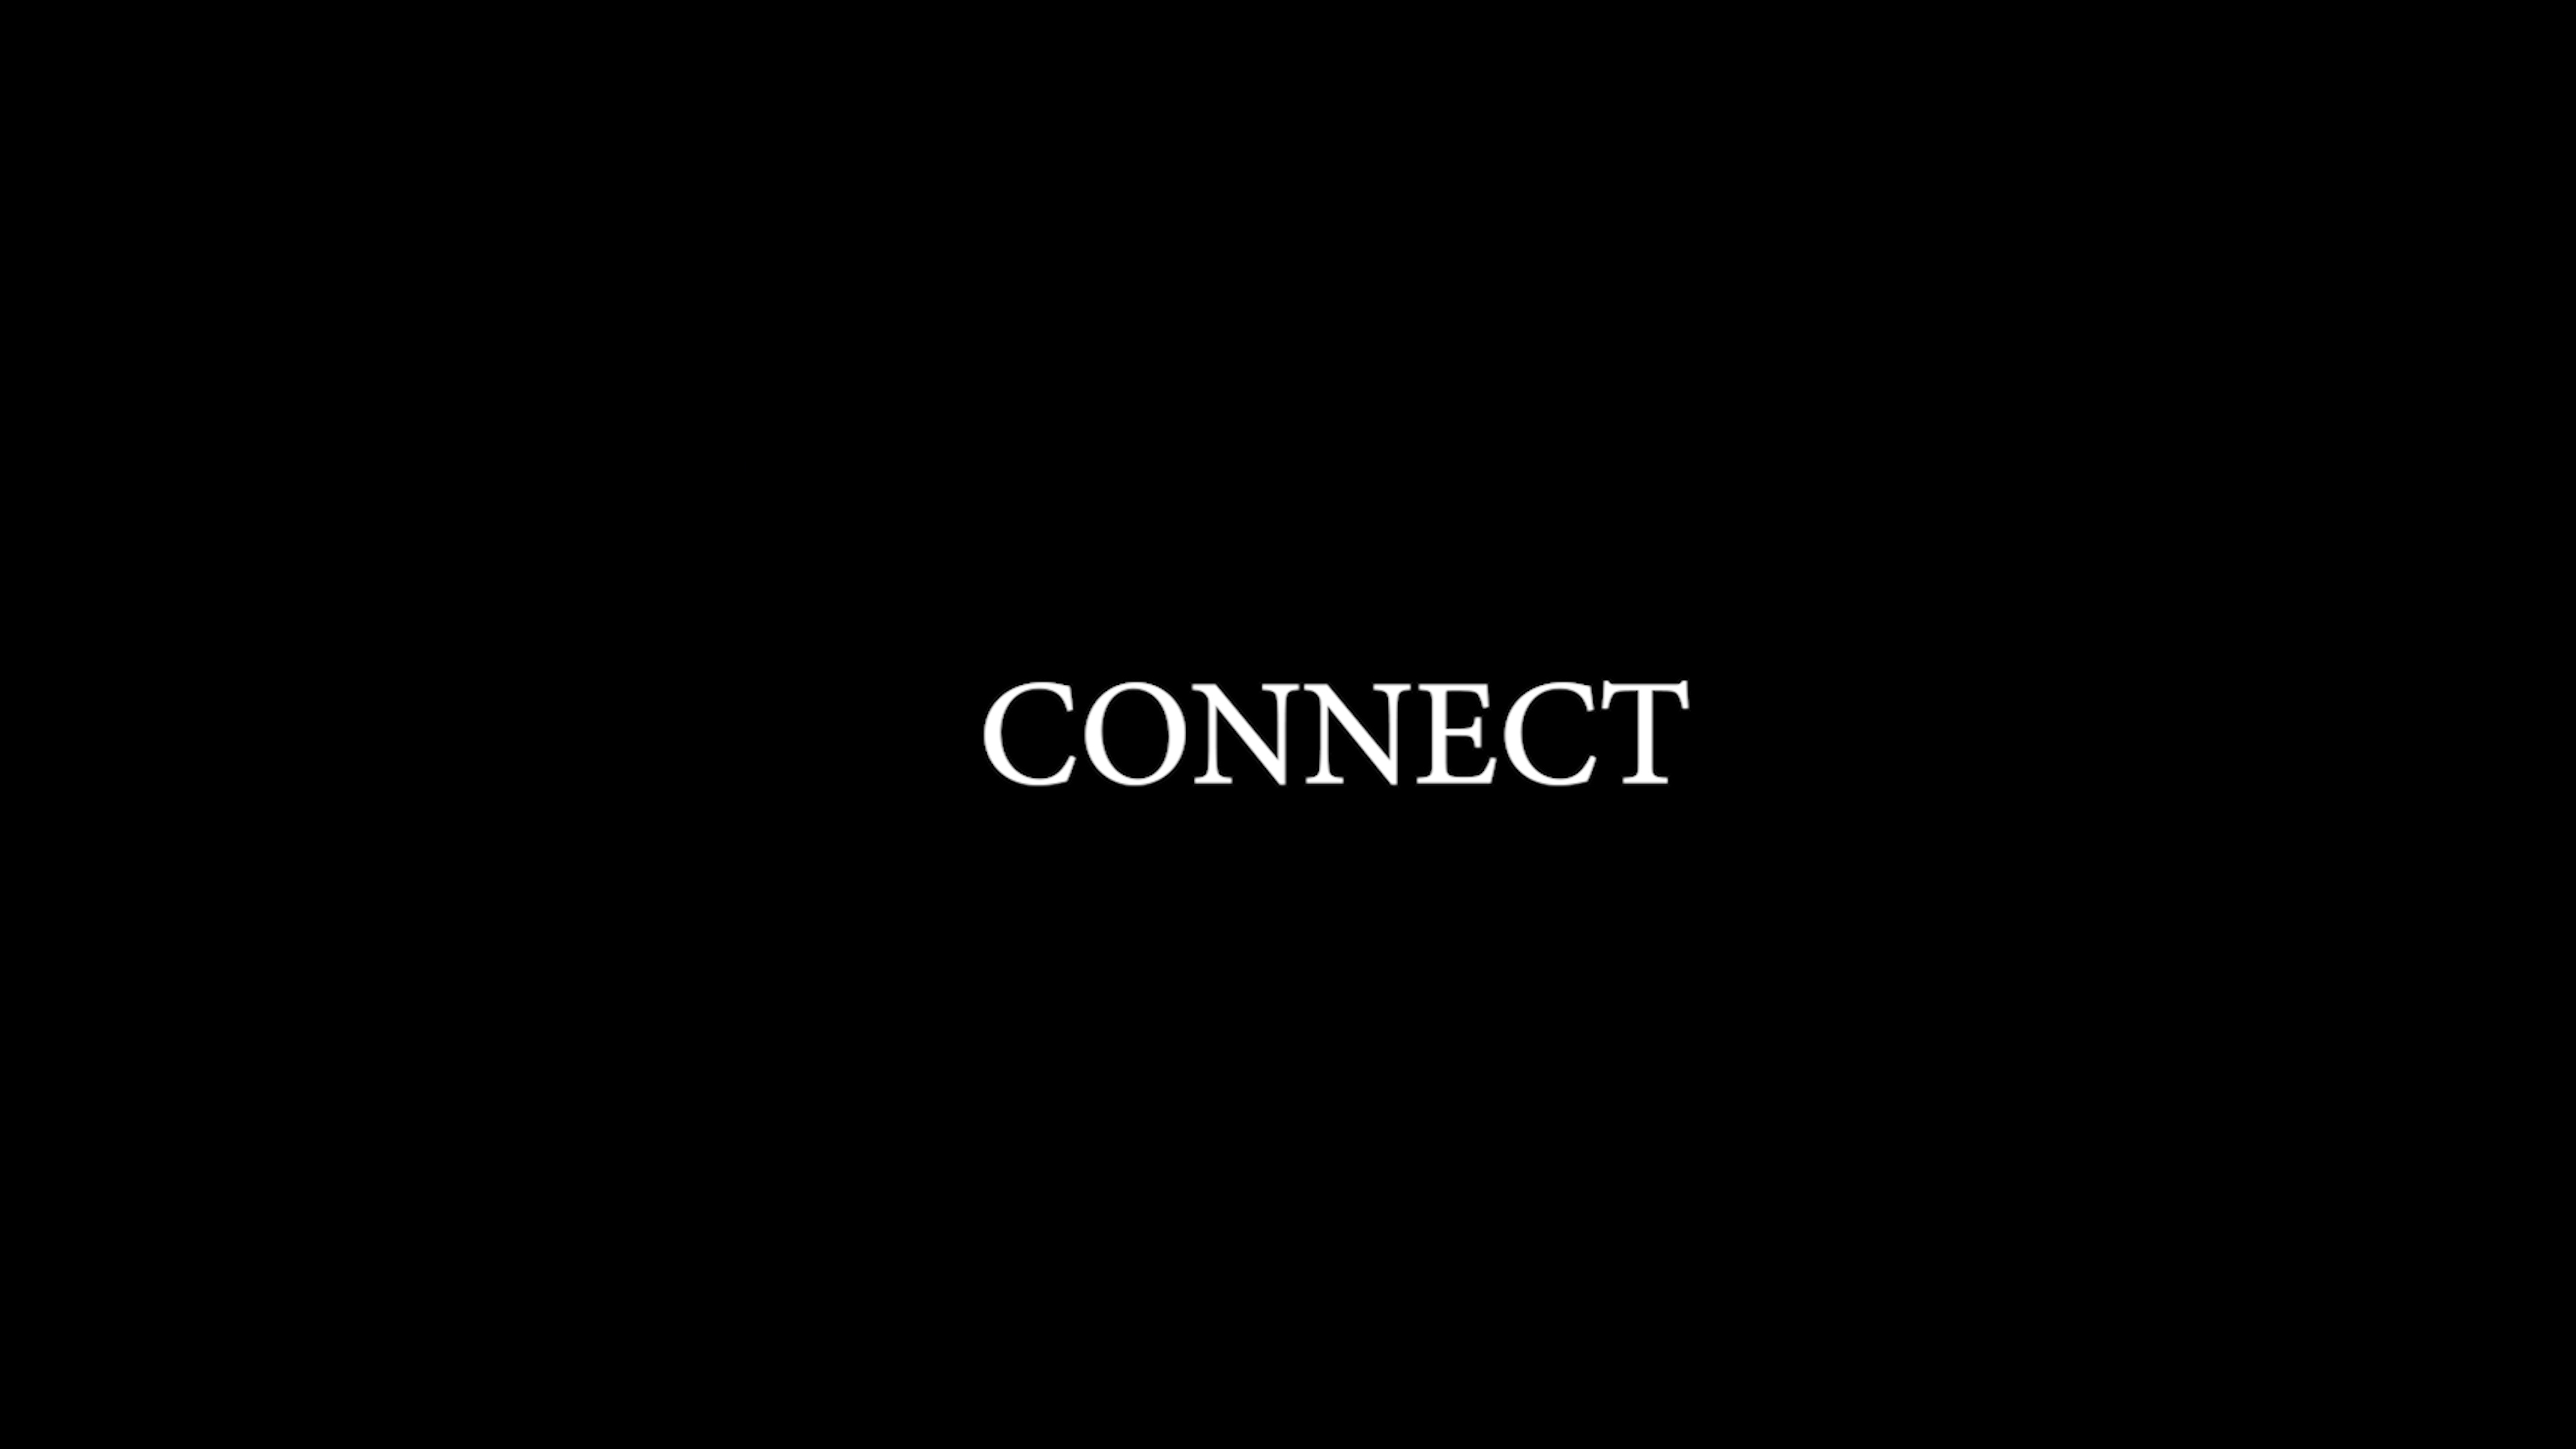 CONNECT - My RØDE Reel 2020